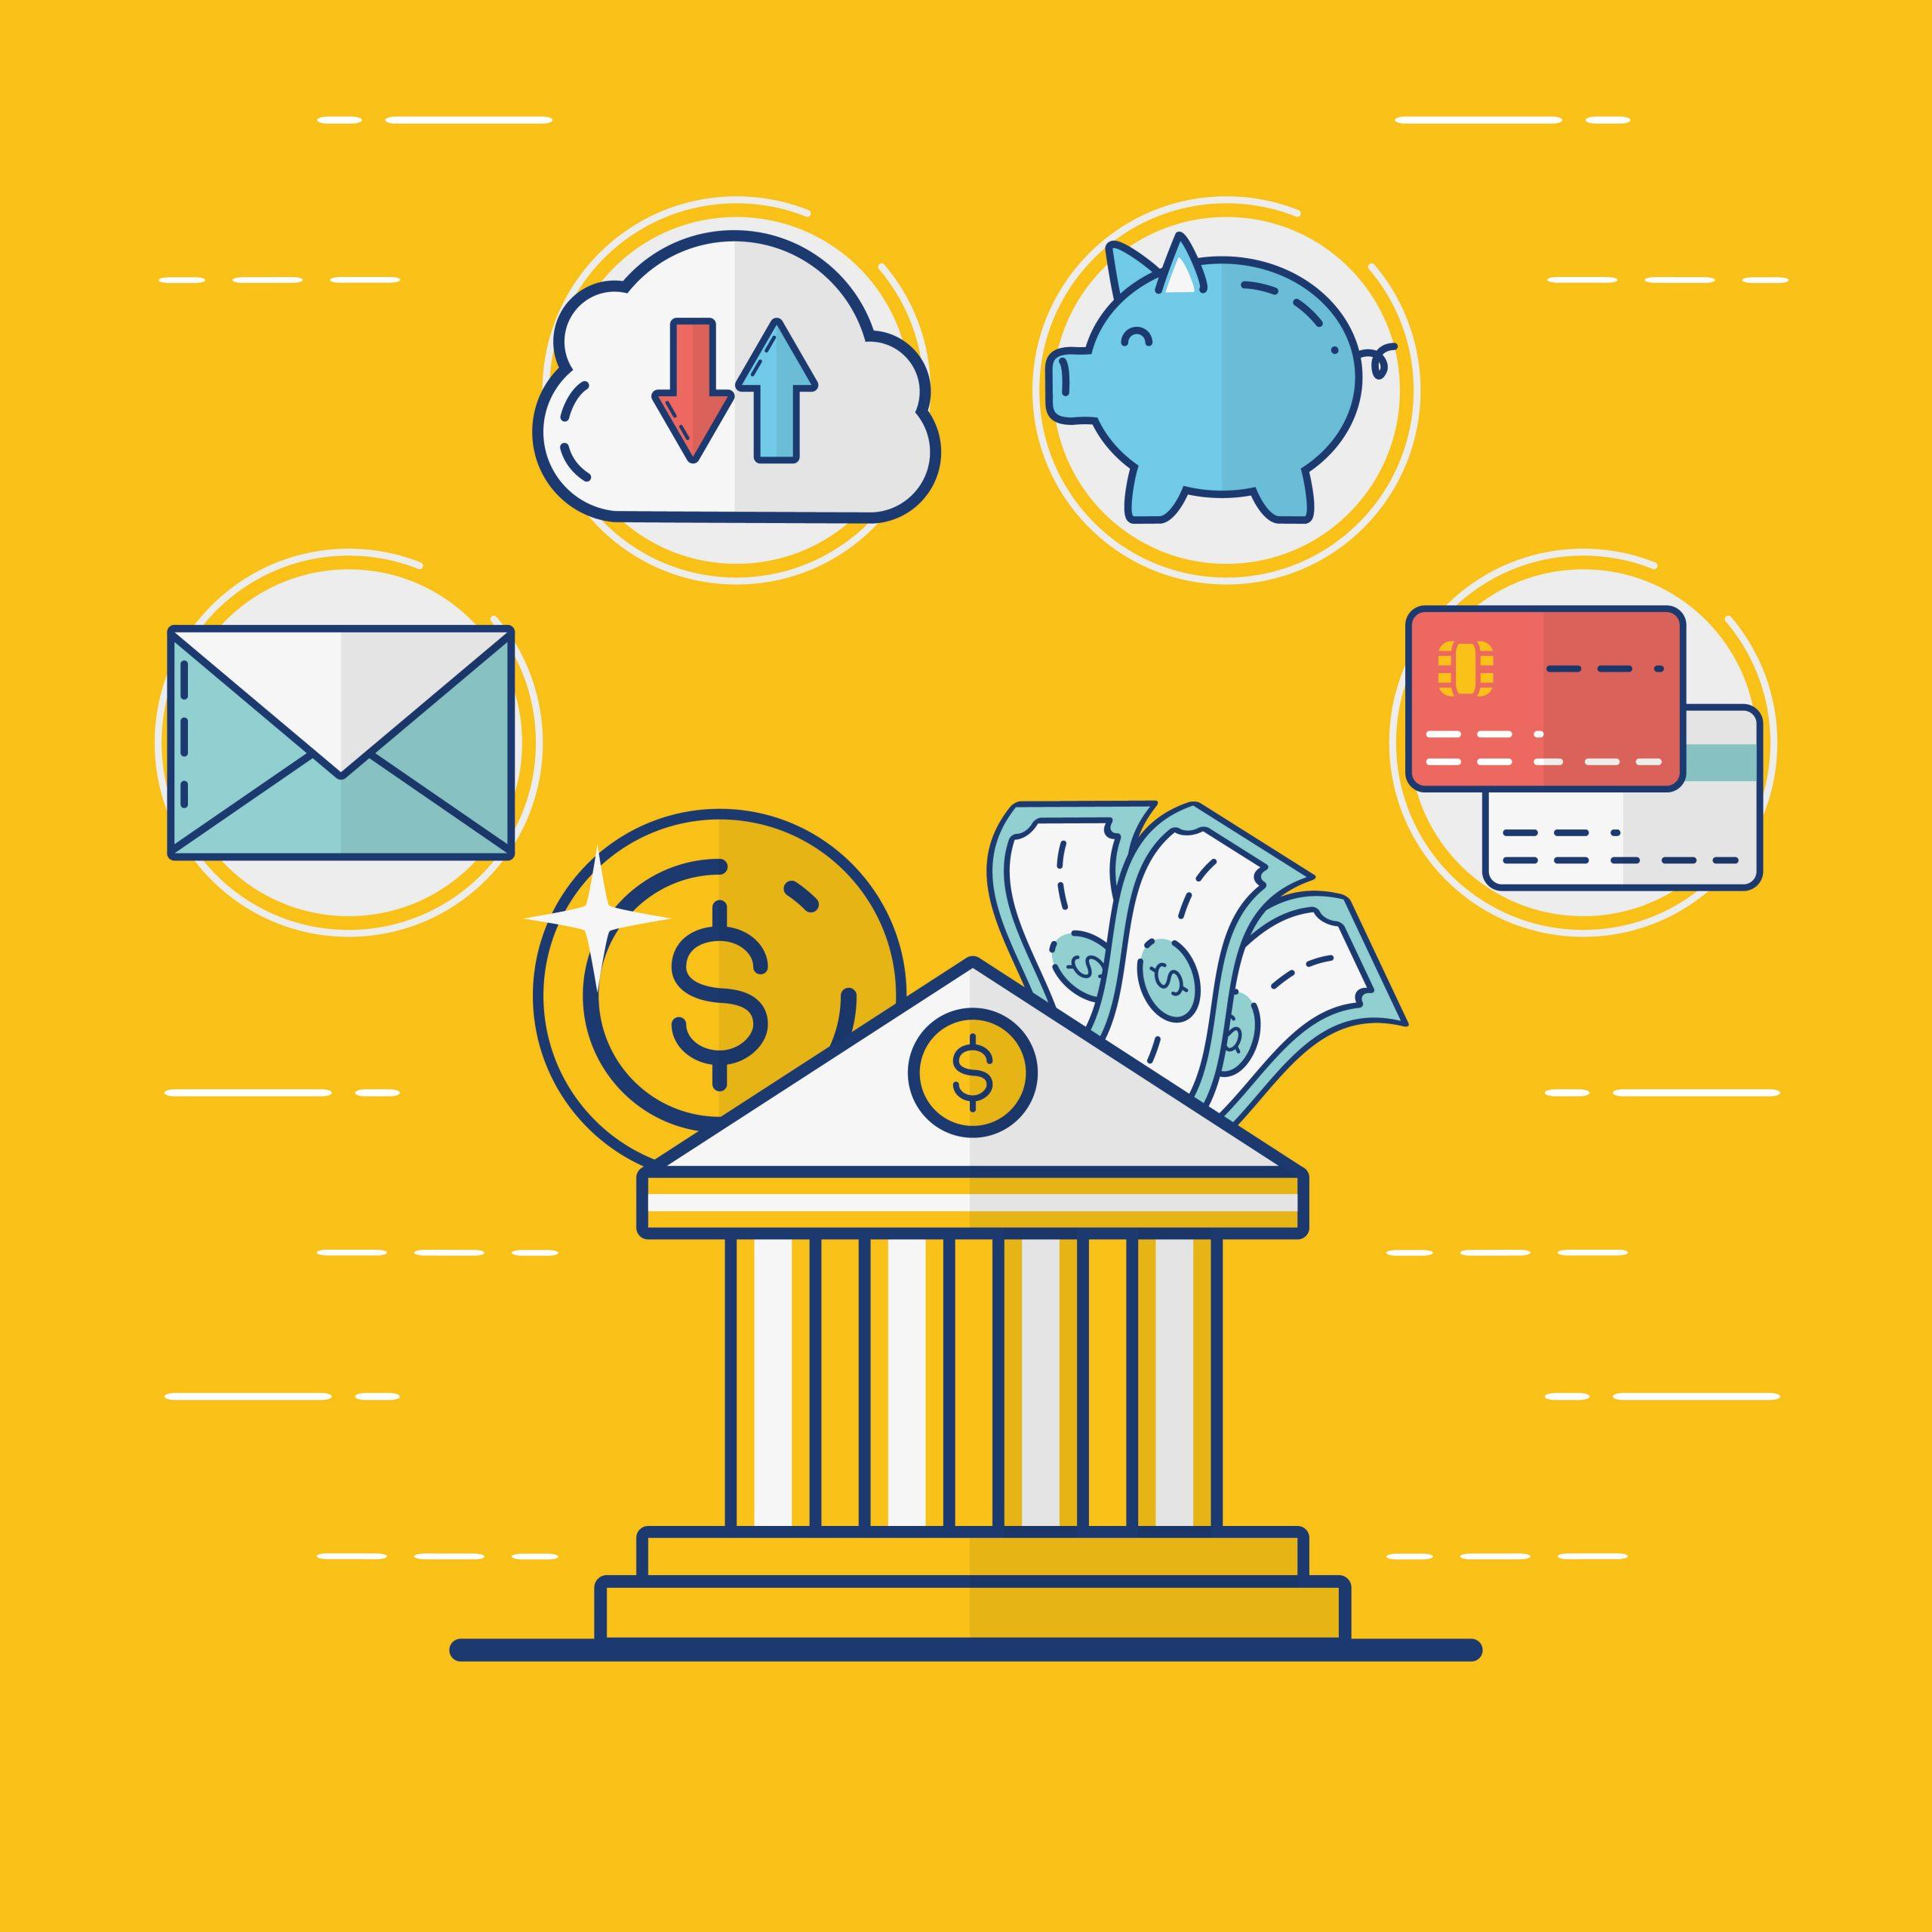 Walmart MoneyCard Offers Free Cash Deposits via Their Mobile App